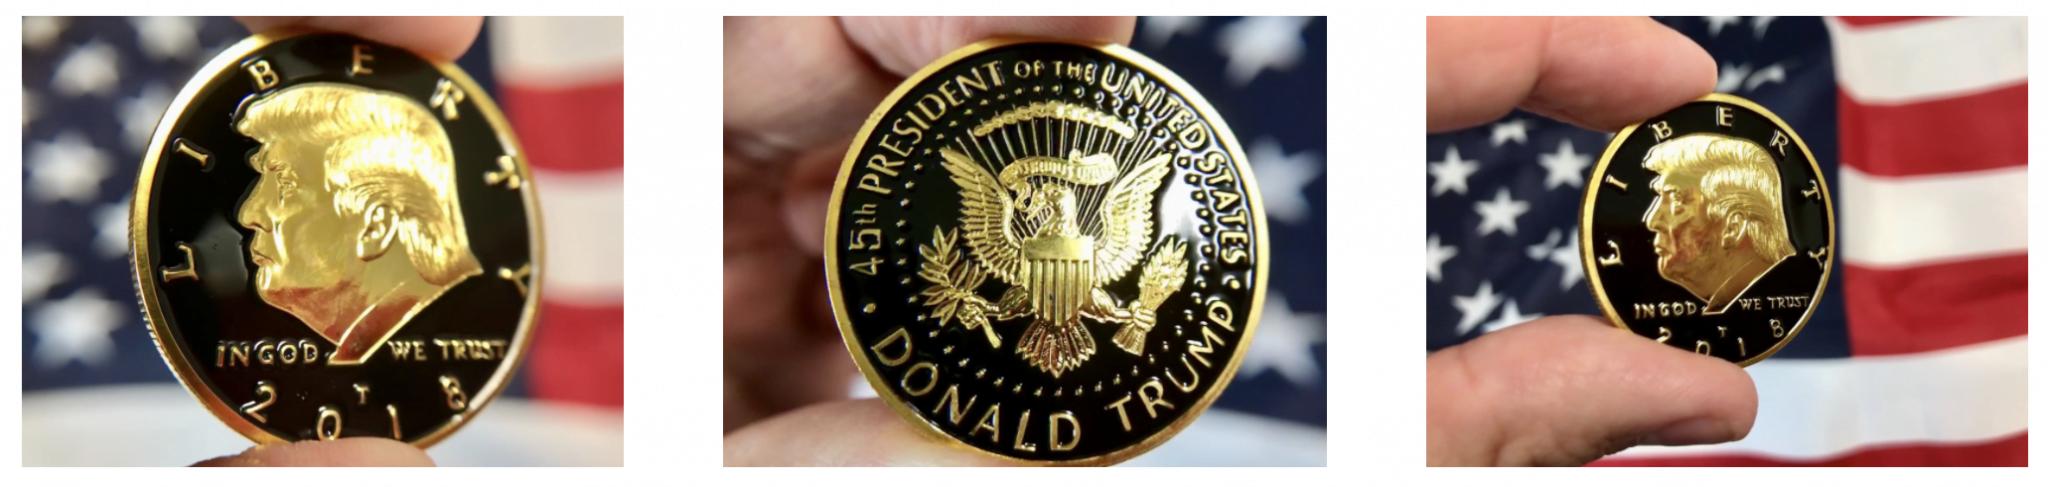 daily patriot trump coin